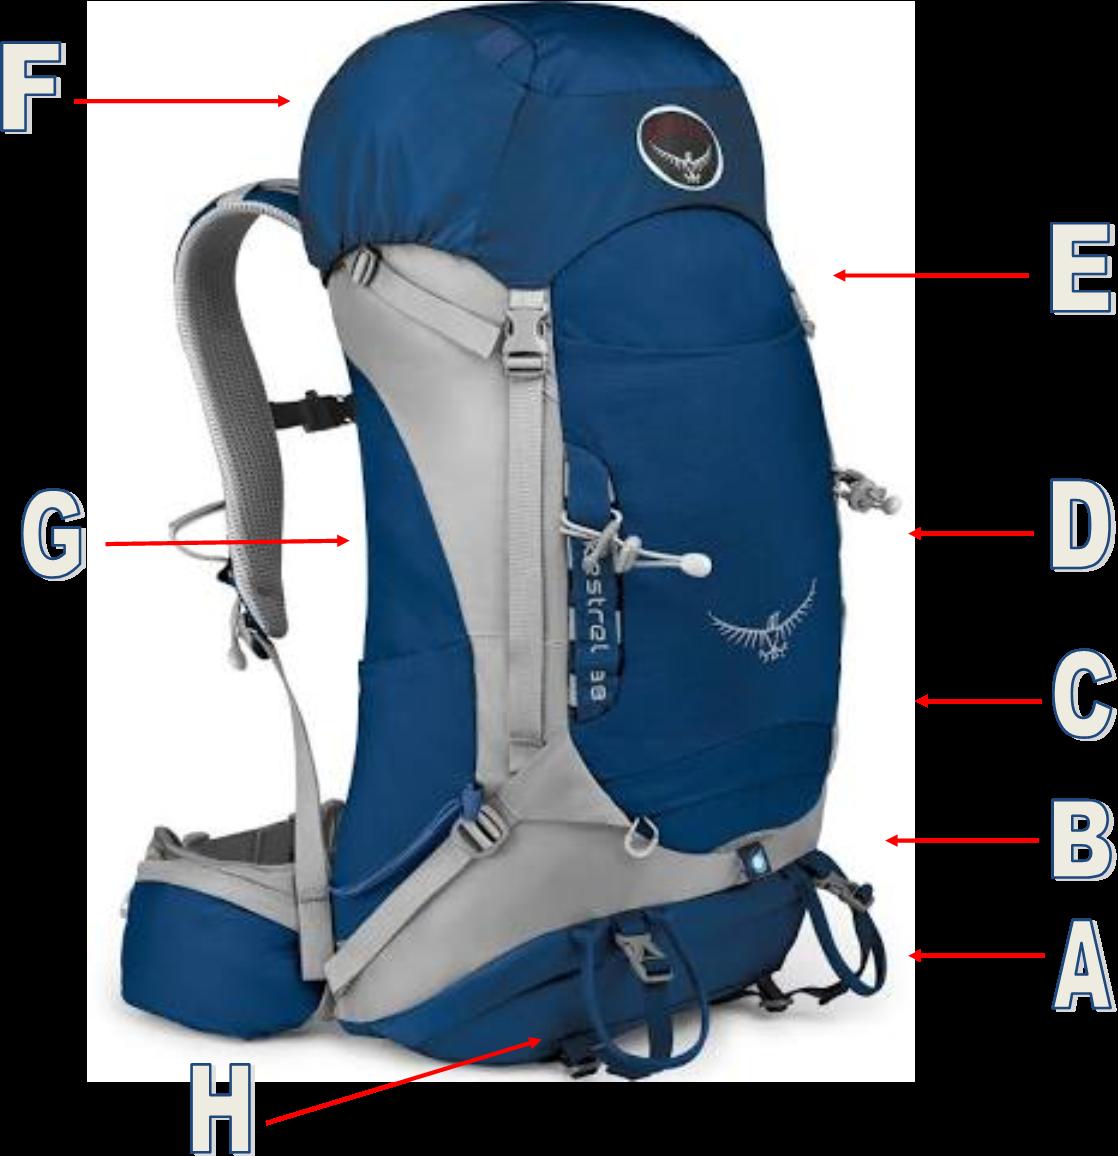 hike clipart travel backpack